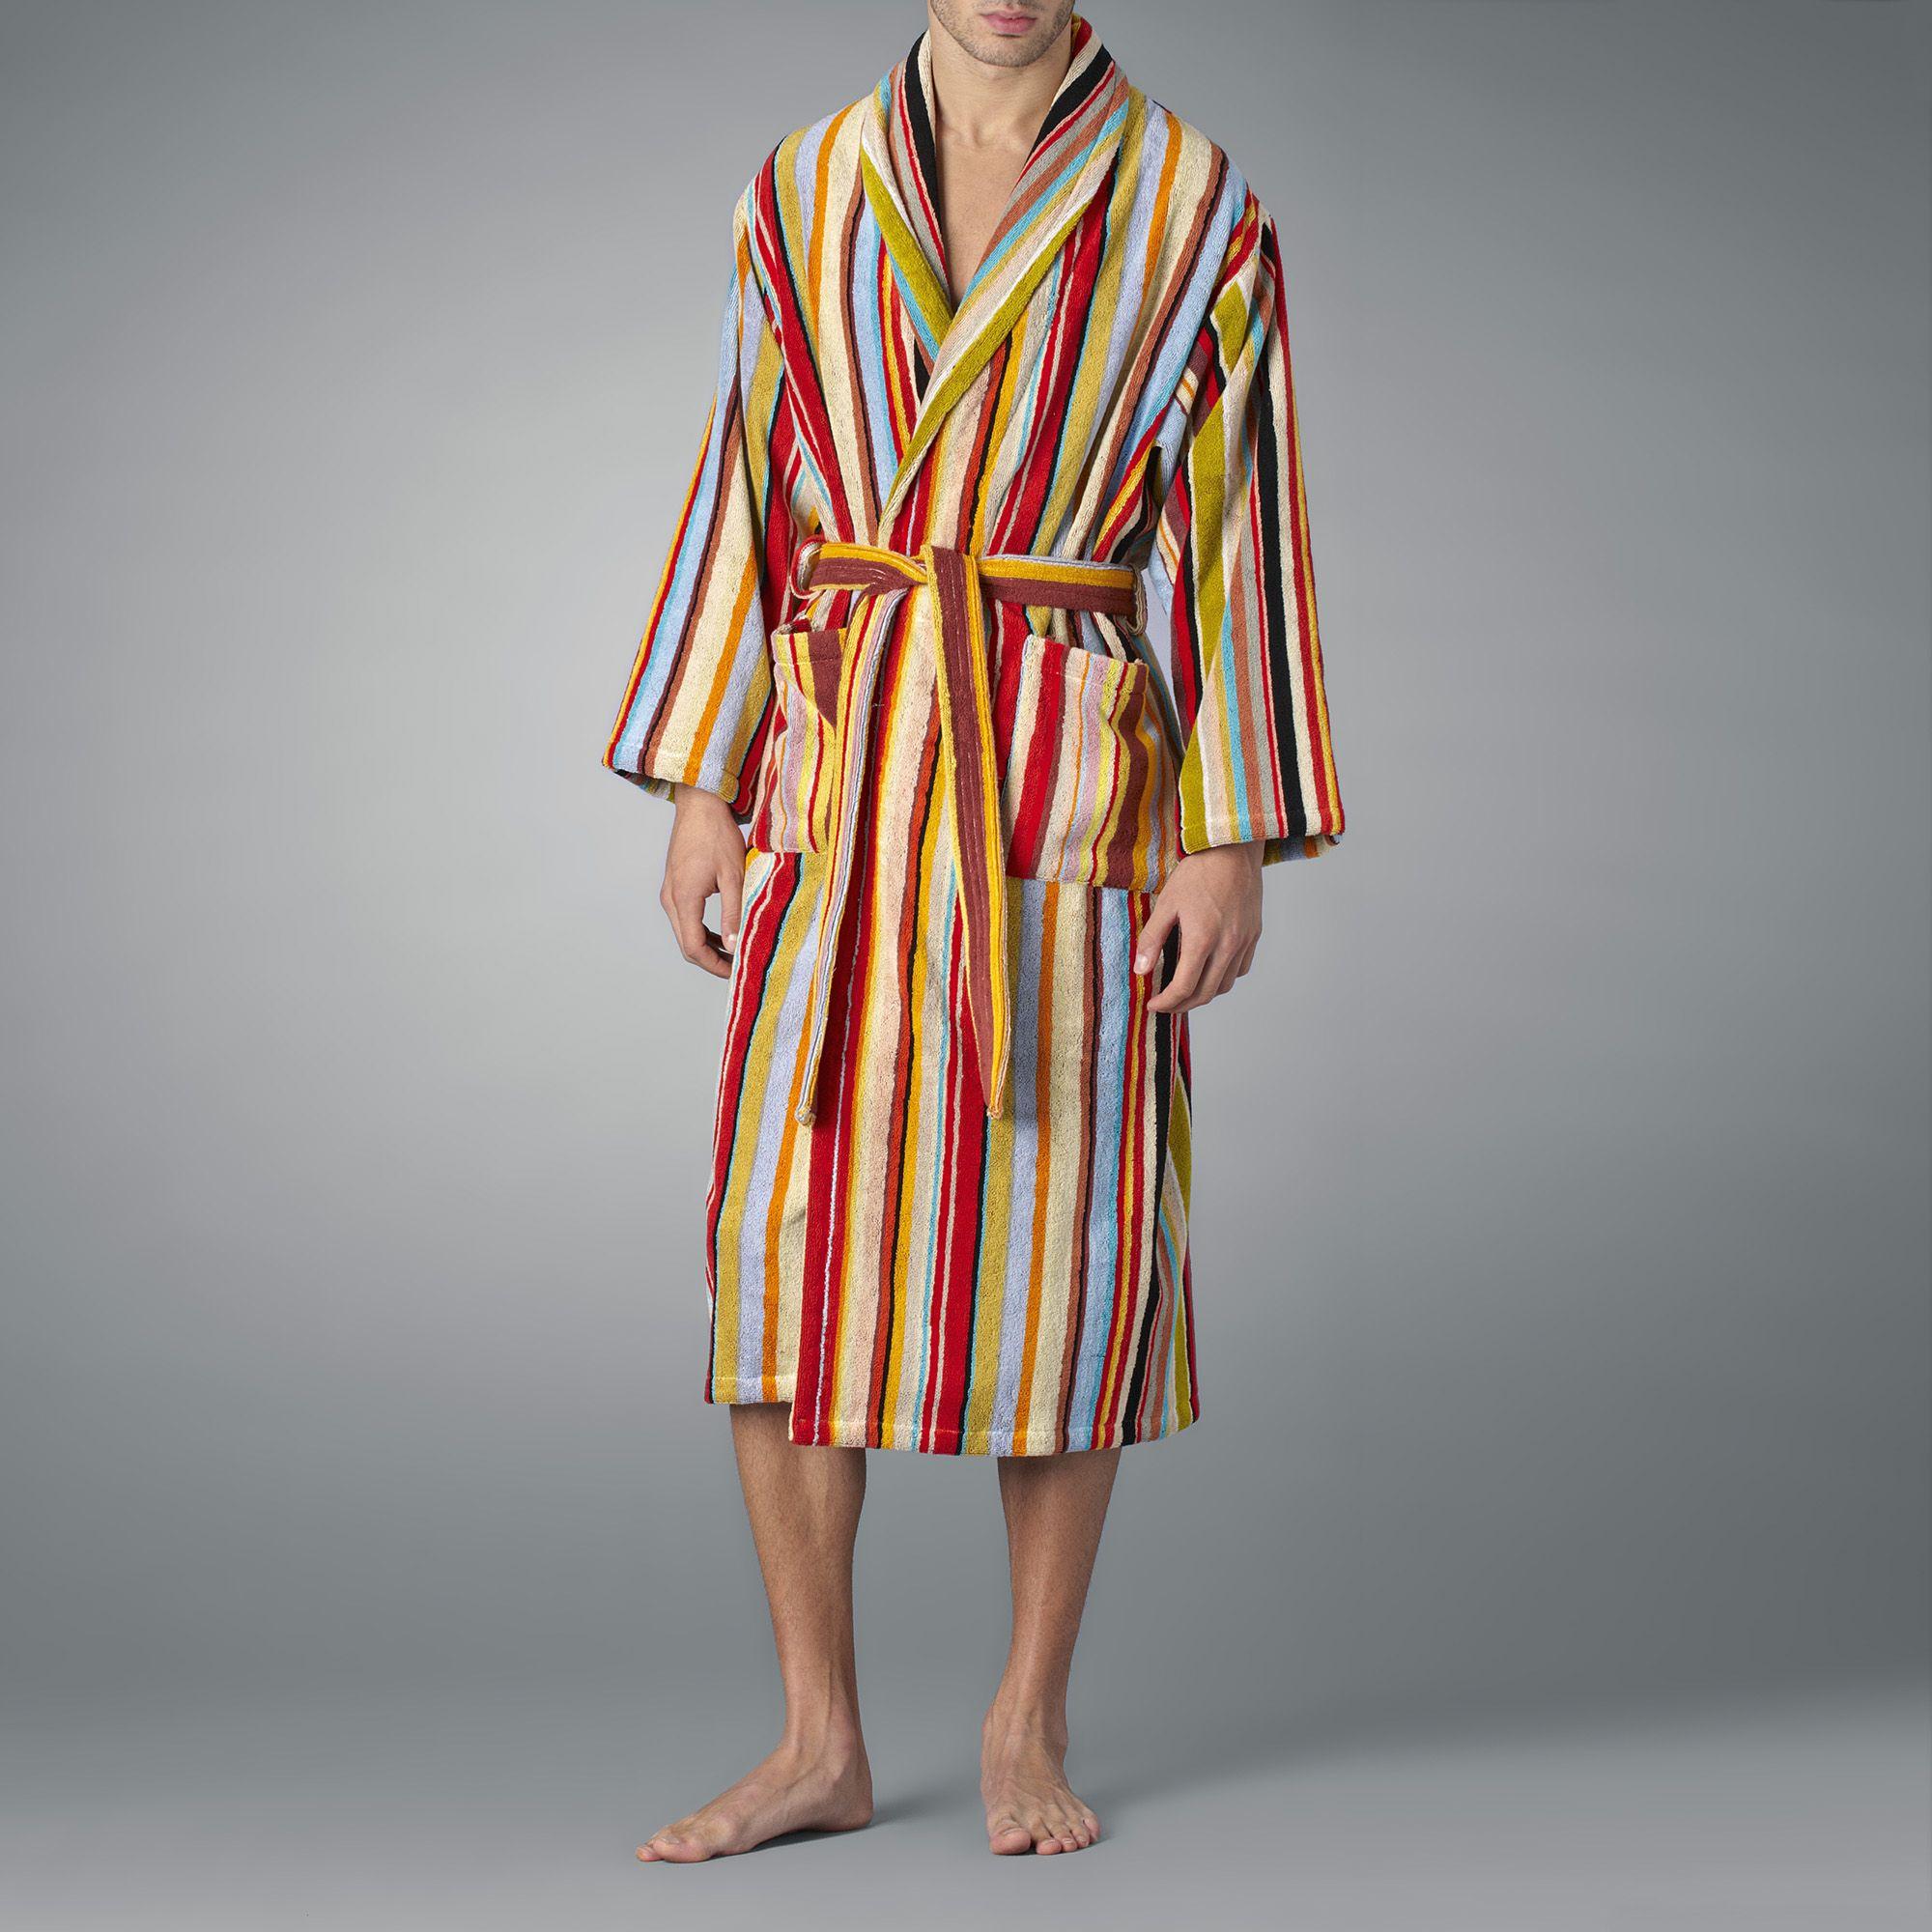 6cef8f0b3cbd Paul Smith Striped Towelling Robe for Men - Lyst